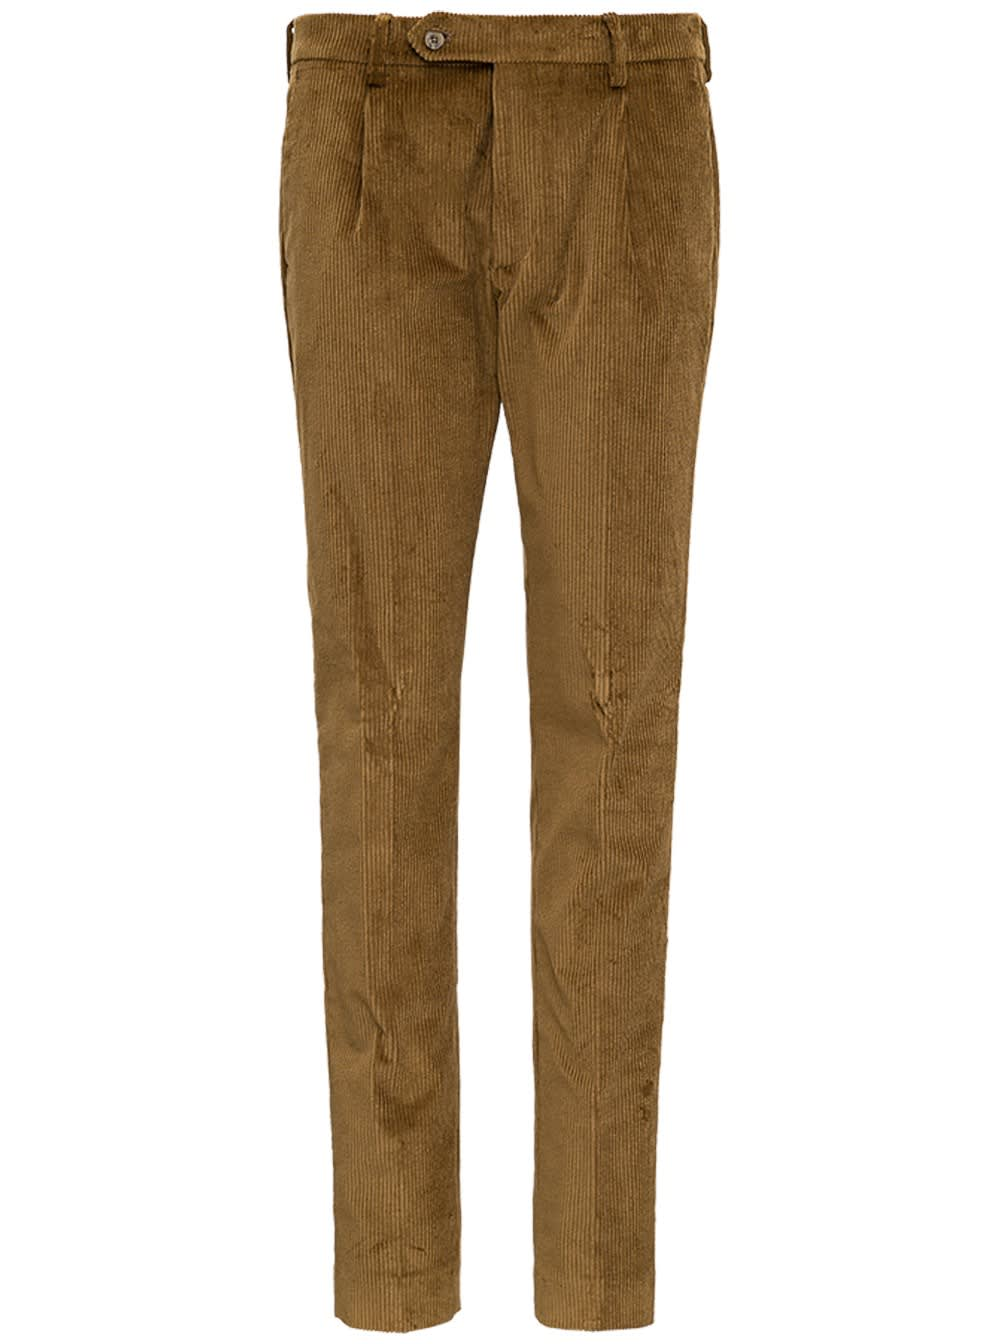 Camel Colored Velvet Pants